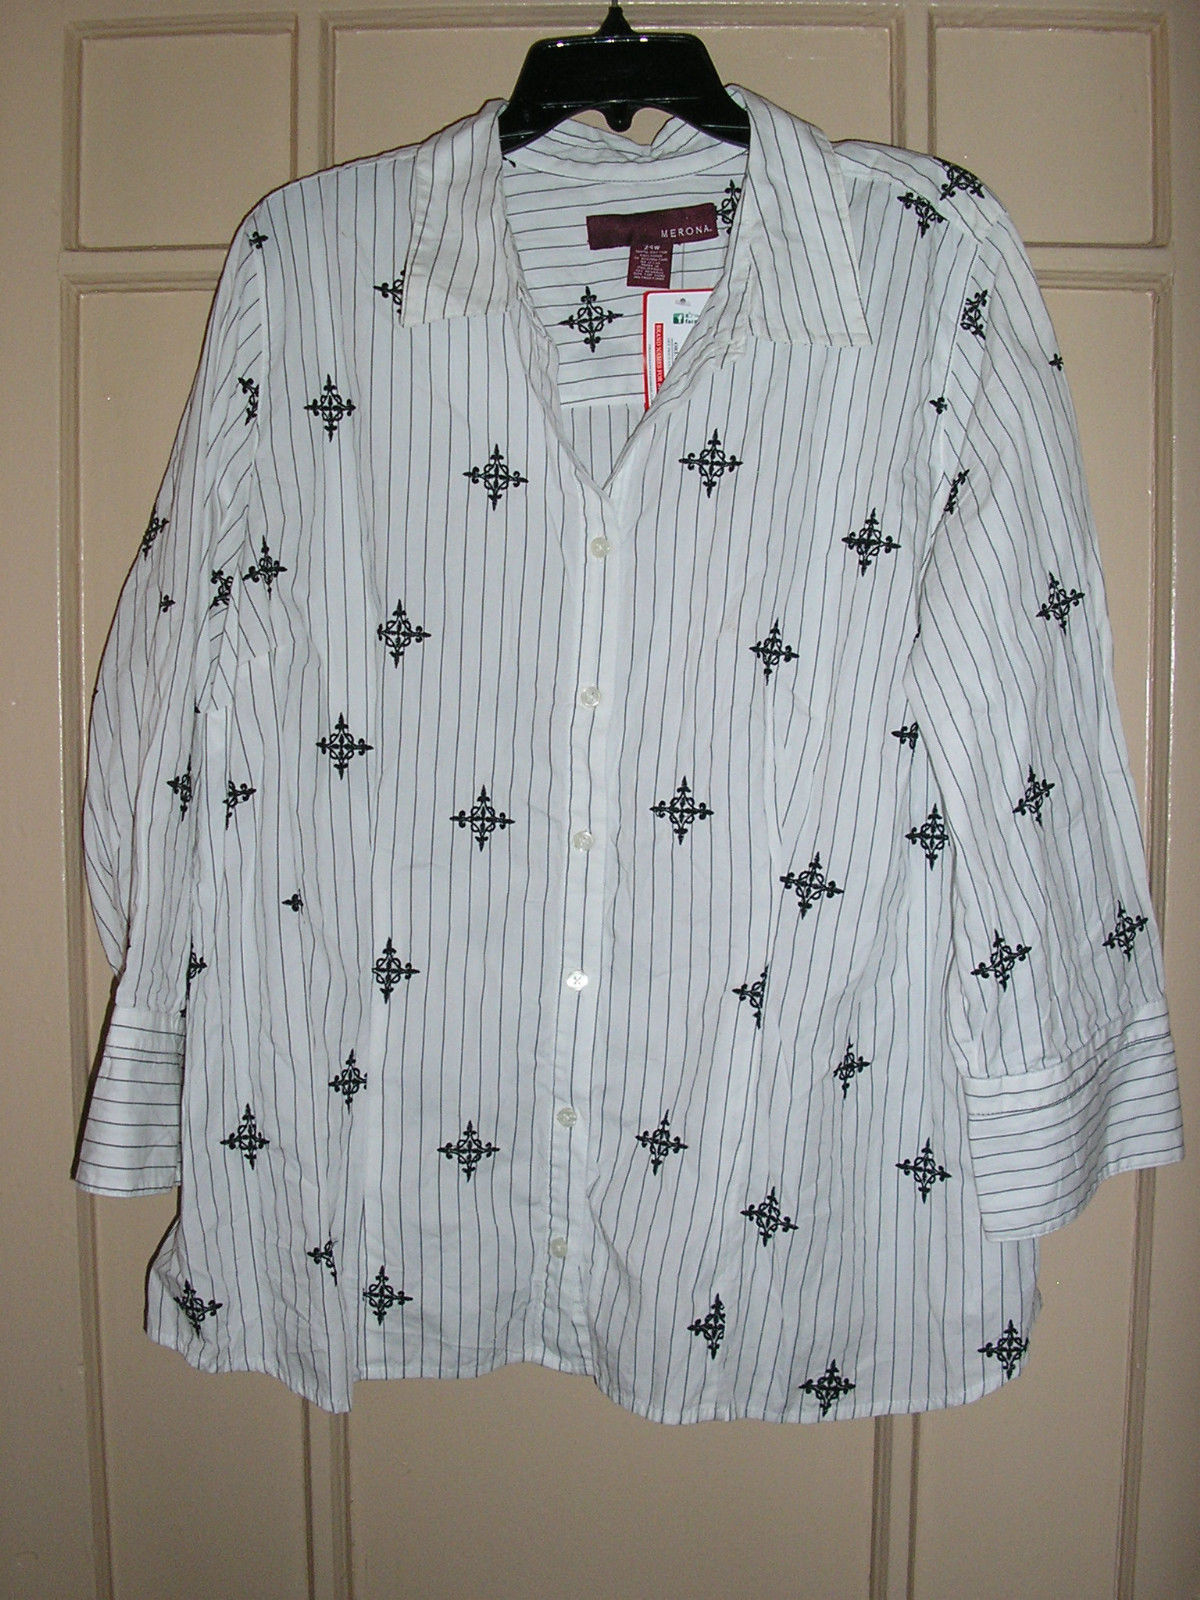 plus size black white pinstripes embroidered button down cotton shirt 24 24w